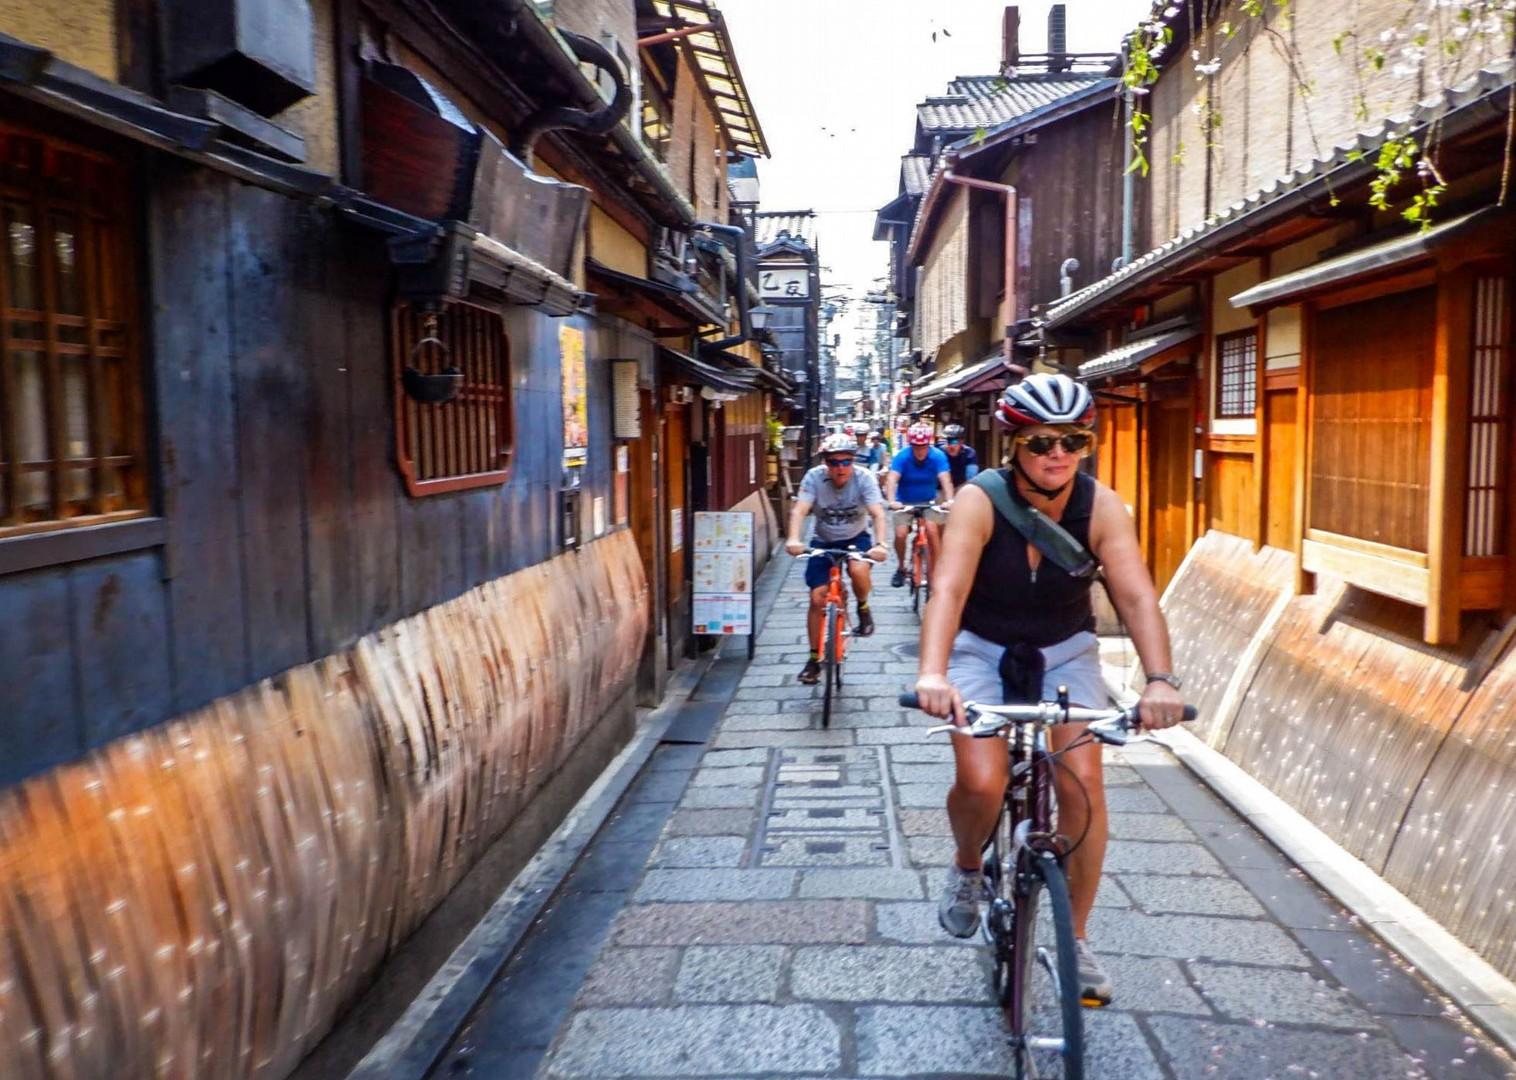 taka_22_apr_DSCF1706.jpg - Japan - Classic Japan - Fuji to Kyoto - Cycling Holiday - Cycling Adventures